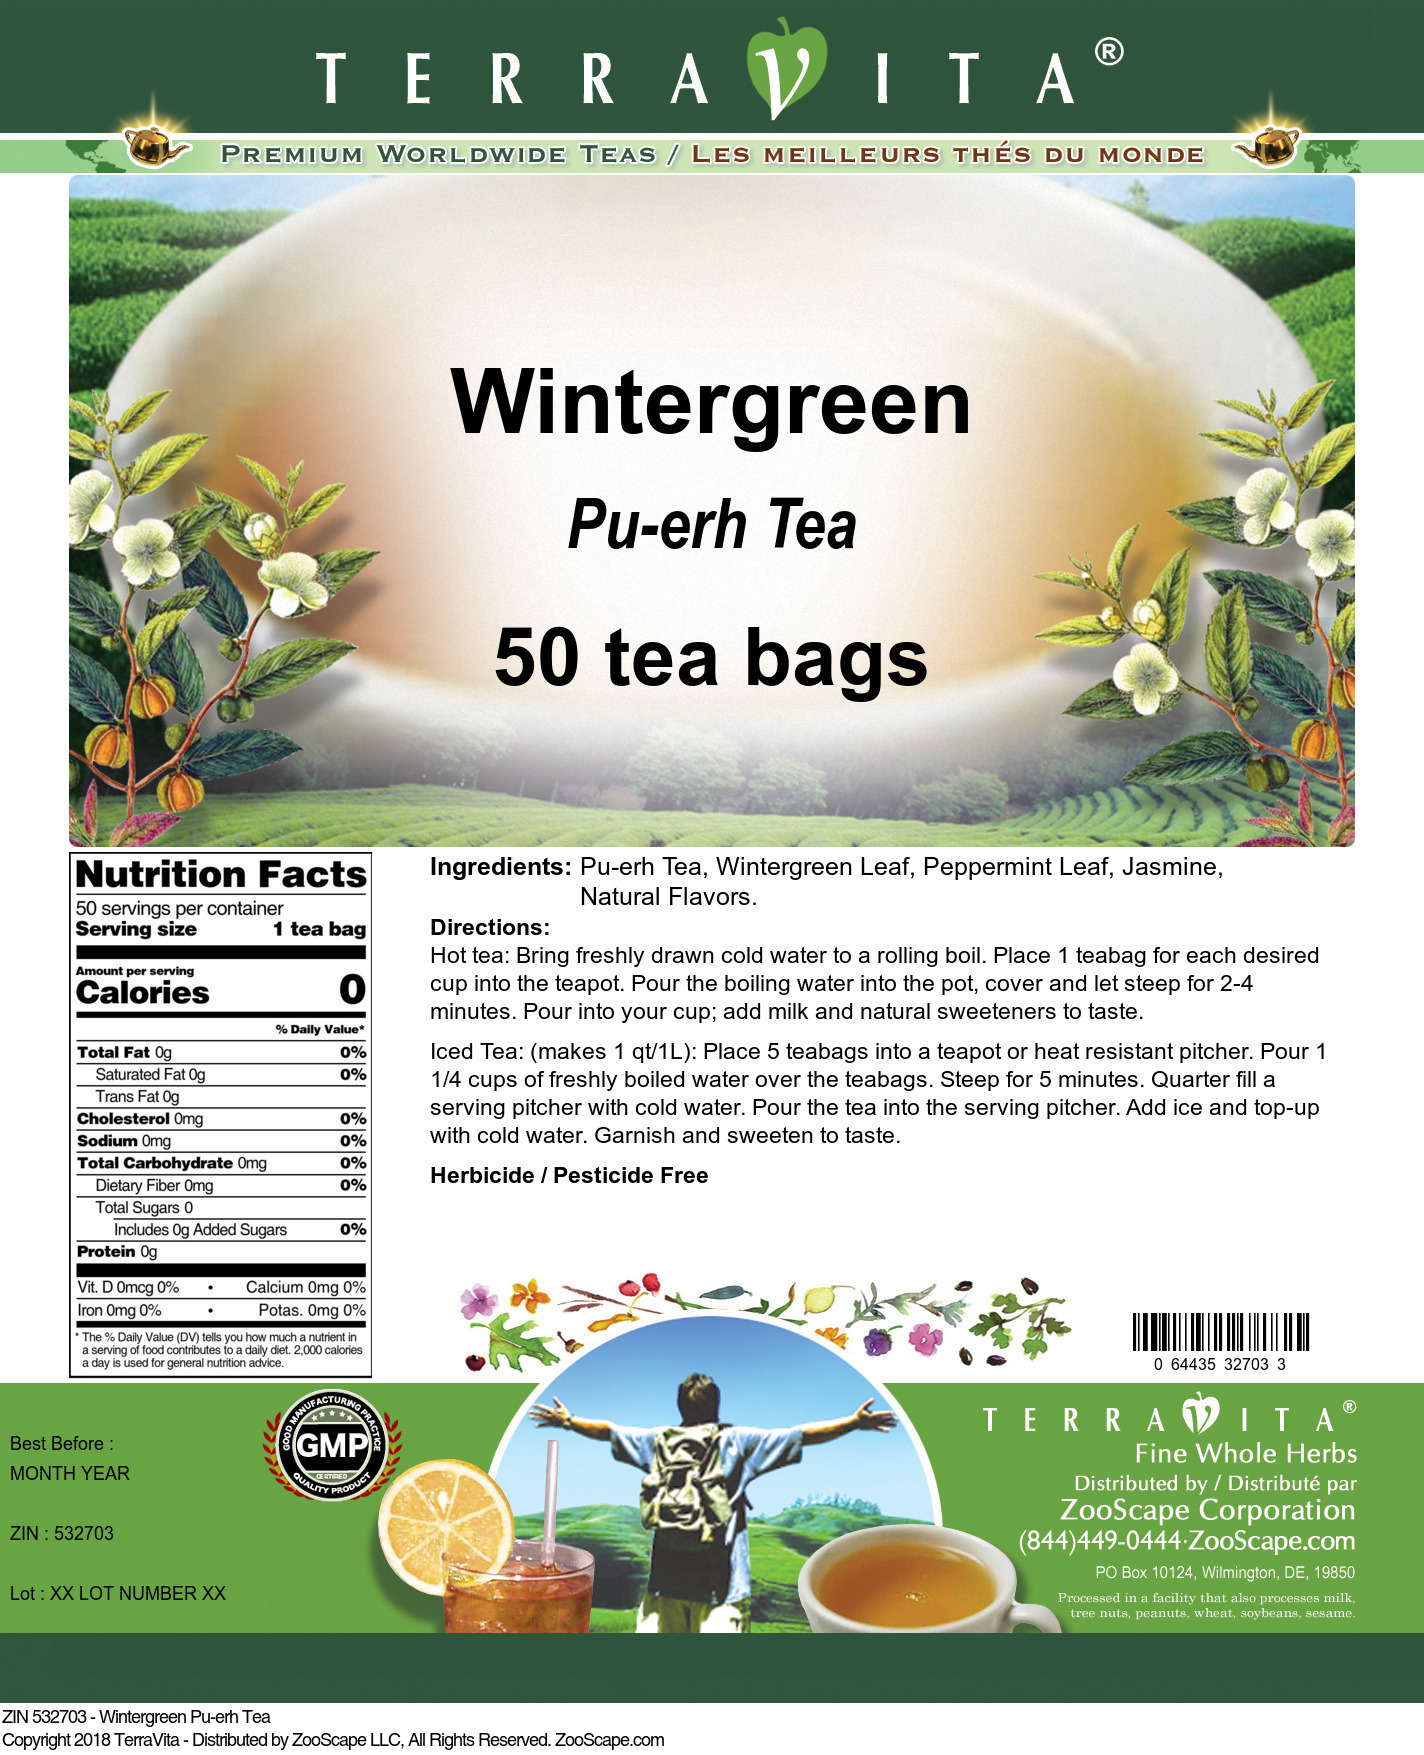 Wintergreen Pu-erh Tea